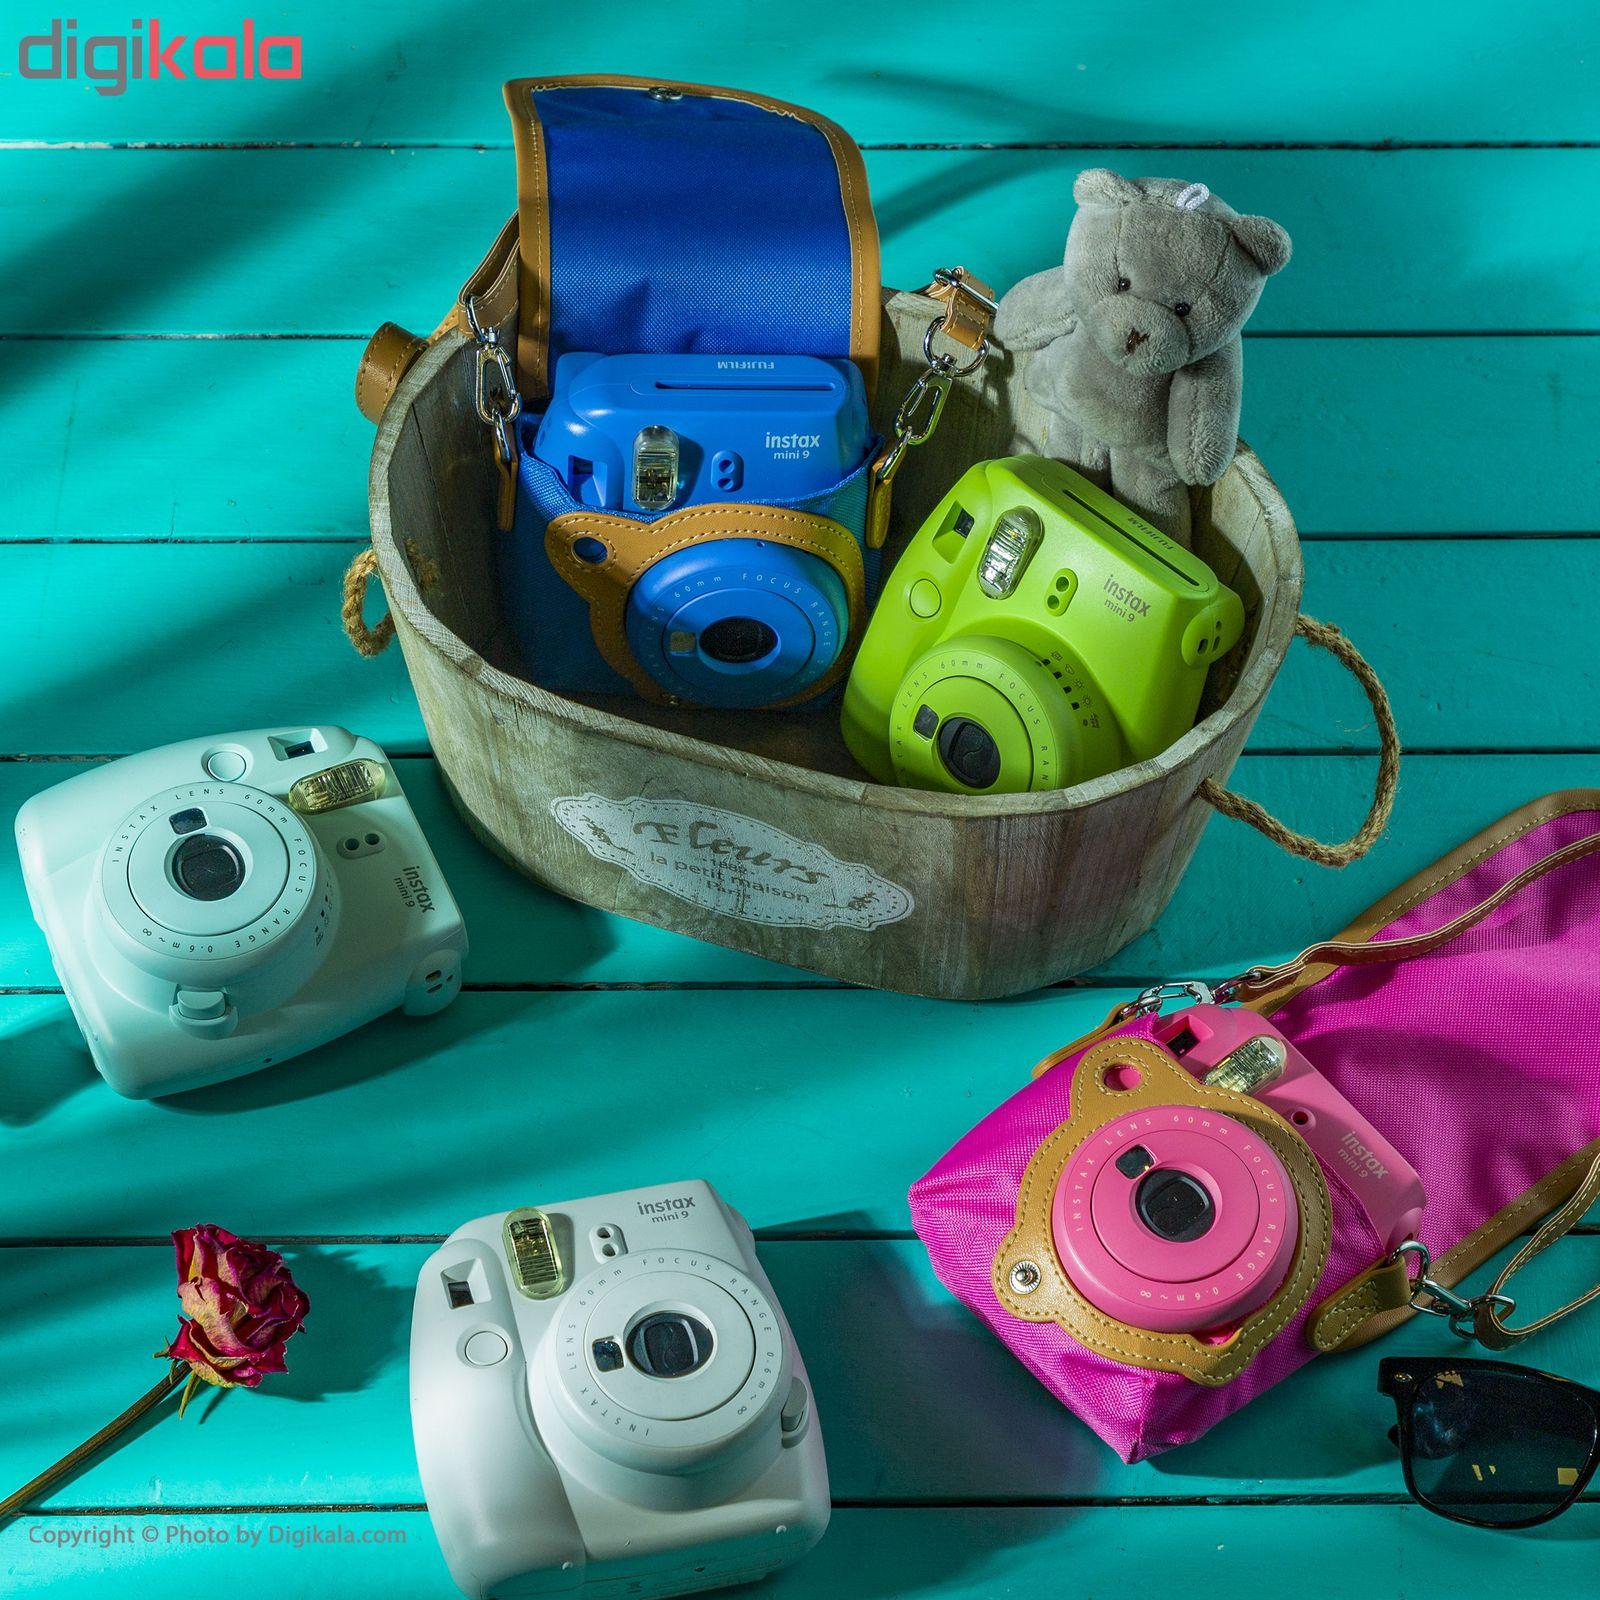 دوربین عکاسی چاپ سریع فوجی فیلم مدل Instax Mini 9 به همراه  فیلم مخصوص main 1 15